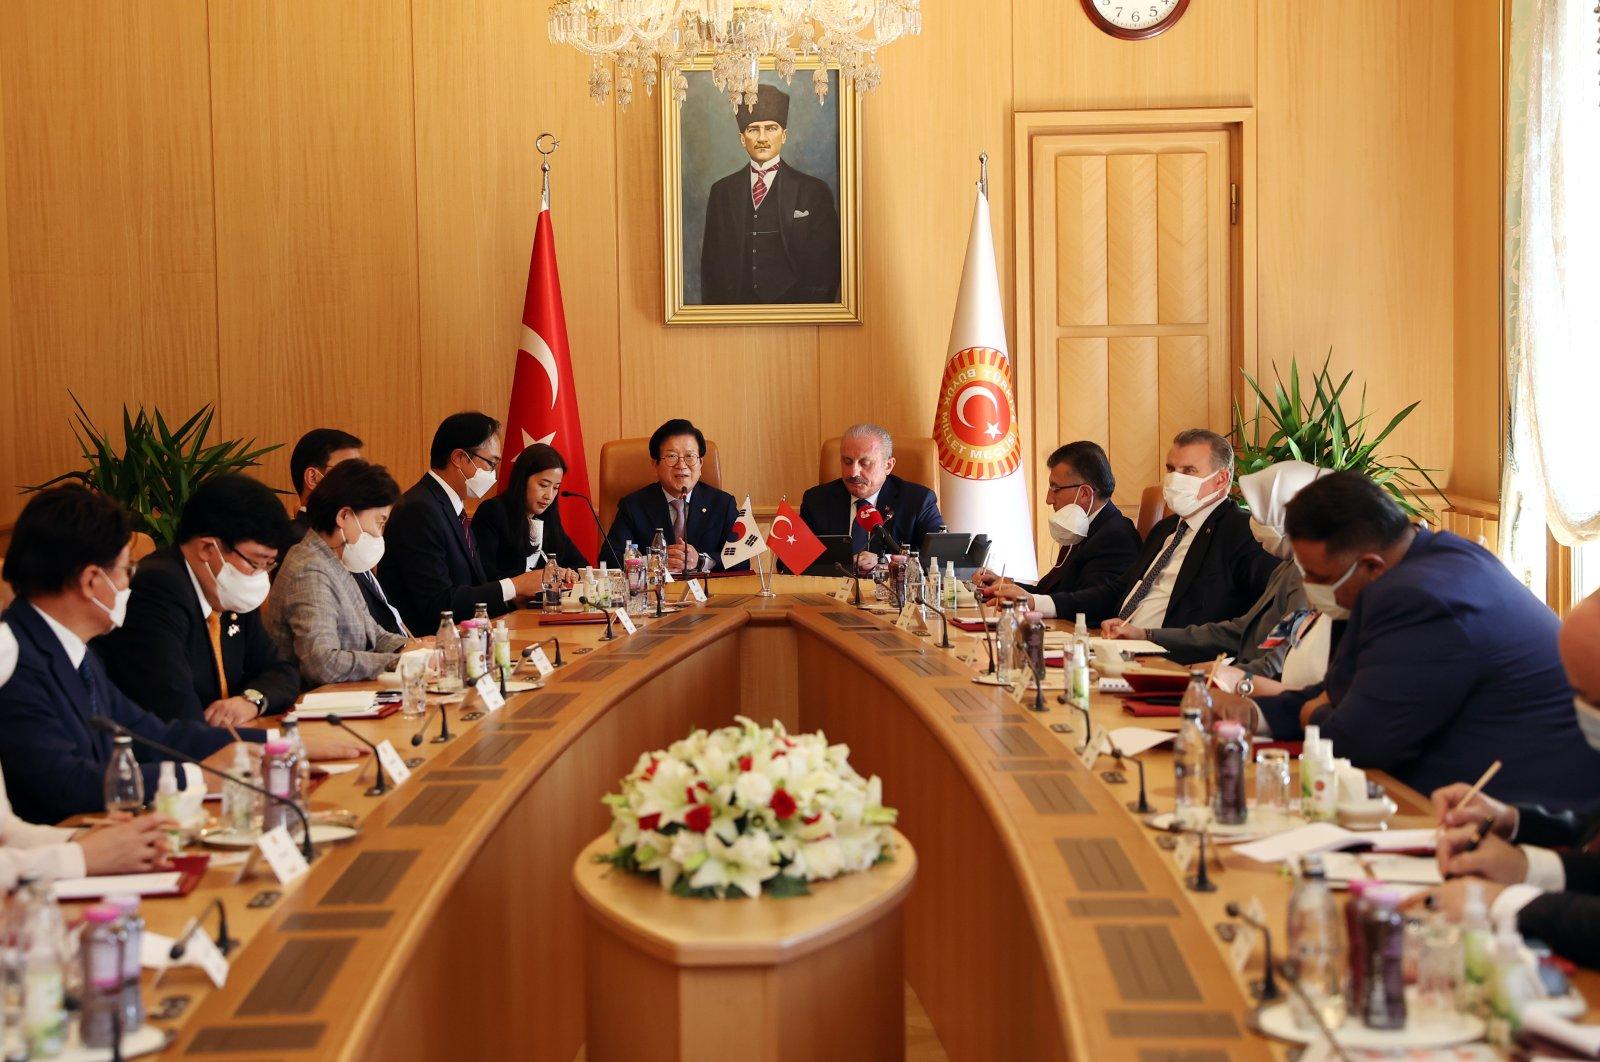 South Korean National Assembly Speaker Park Byeong-seug (C-L) and his Turkish counterpart Mustafa Şentop (C-R) hold talks in Ankara, Turkey, Aug. 17, 2021. (National Assembly of South Korea via EPA)